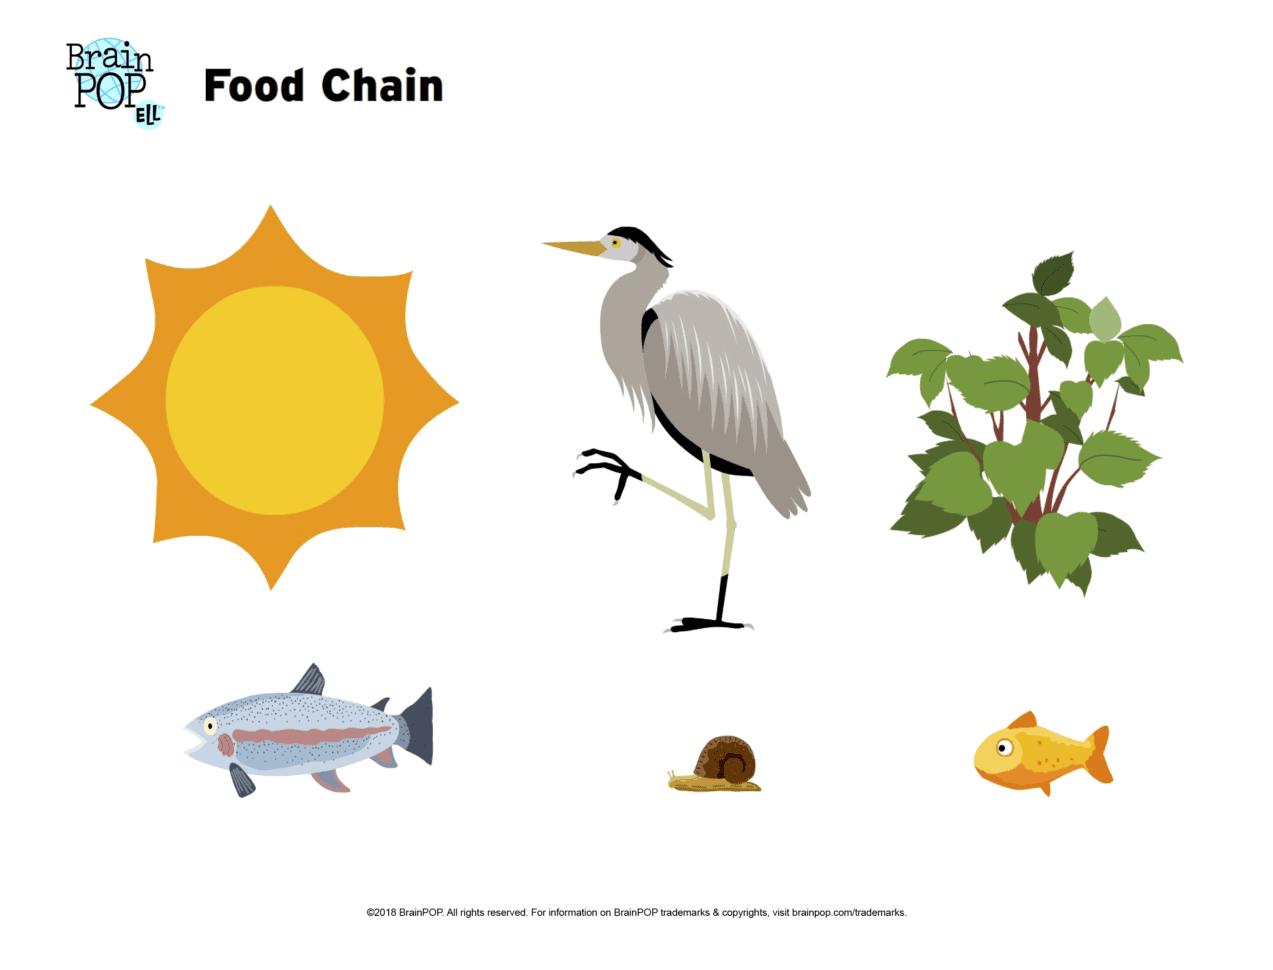 Food Chain Image Worksheet Brainpop Educators